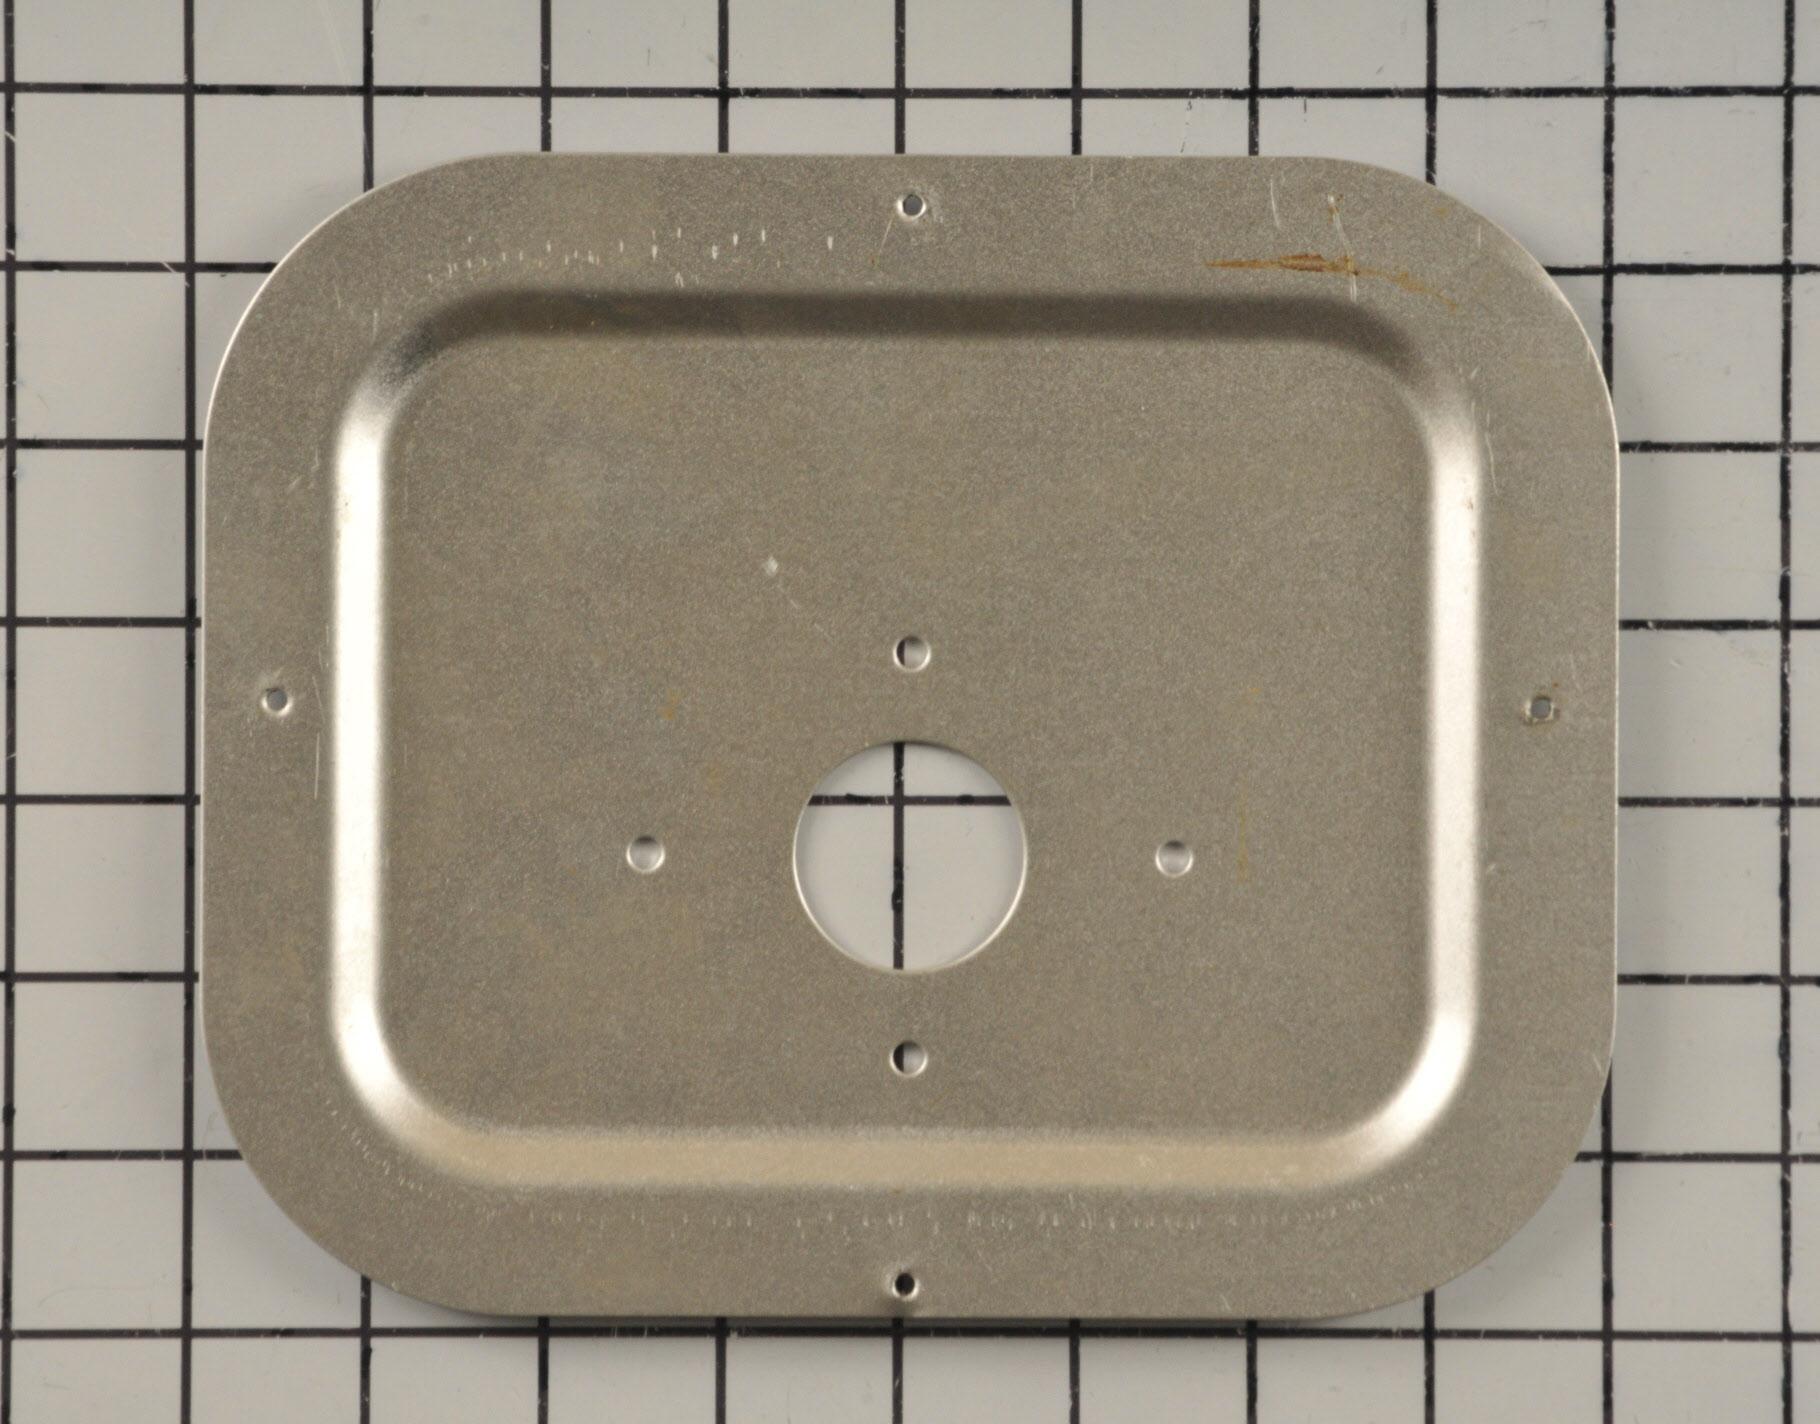 3605F354-45 Jenn Air Range Stove Oven Part -Plate